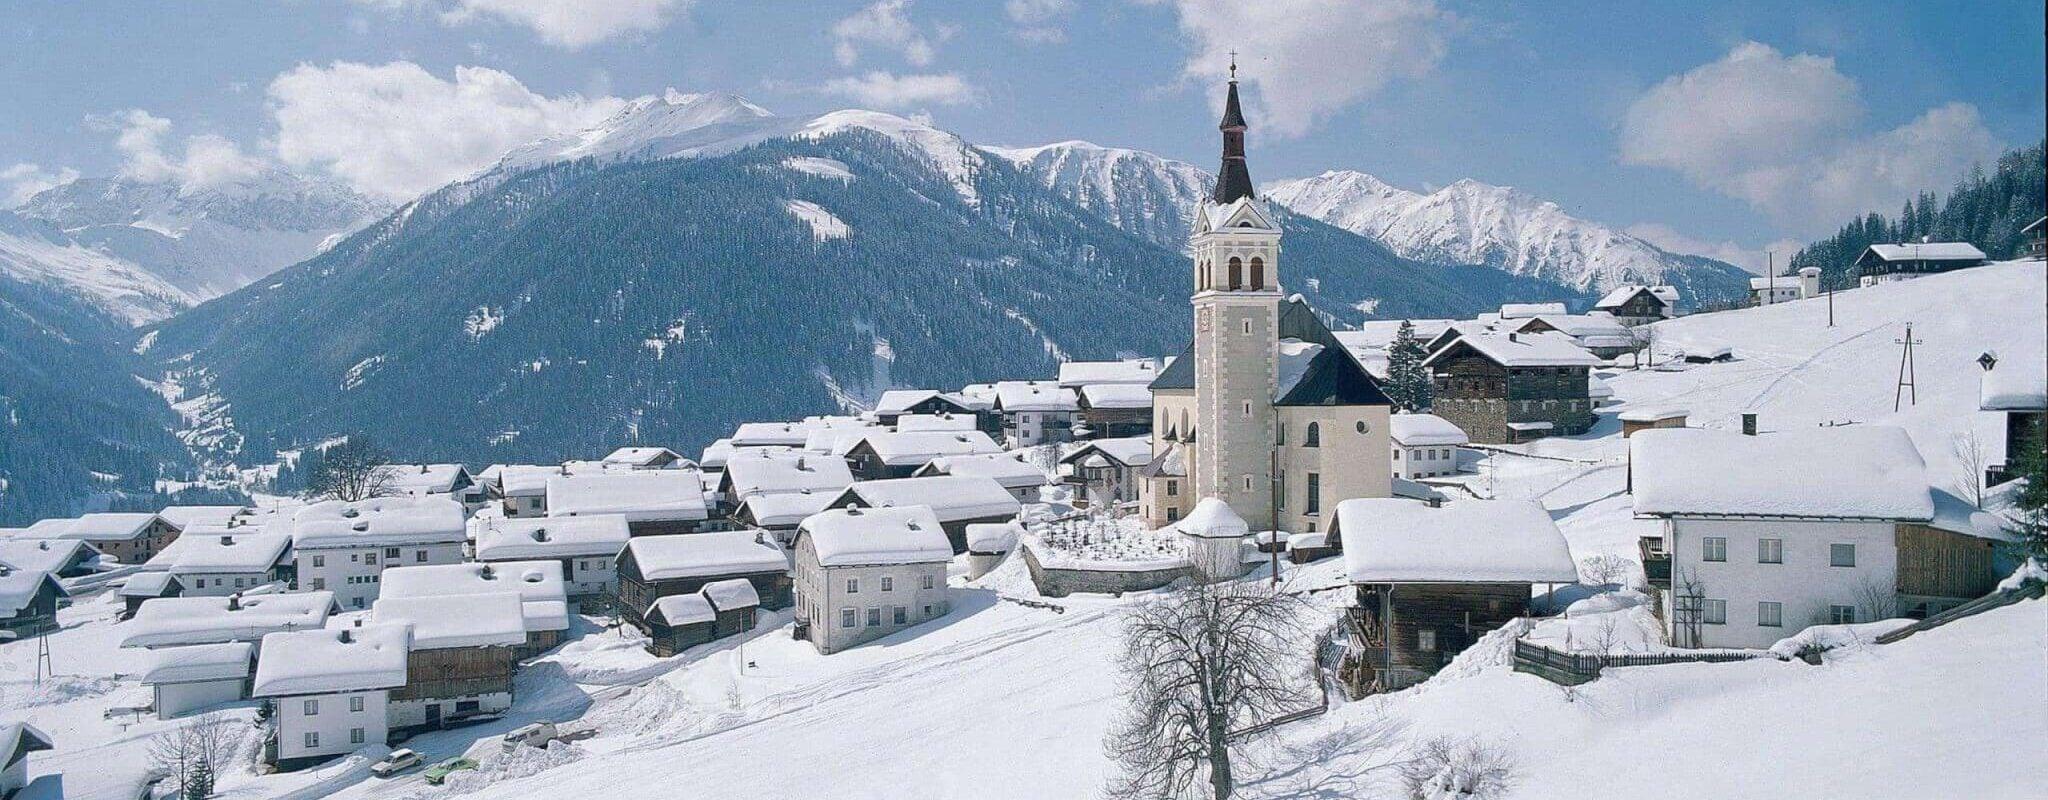 Obertilliach Winter Osttirol Strasserwirt